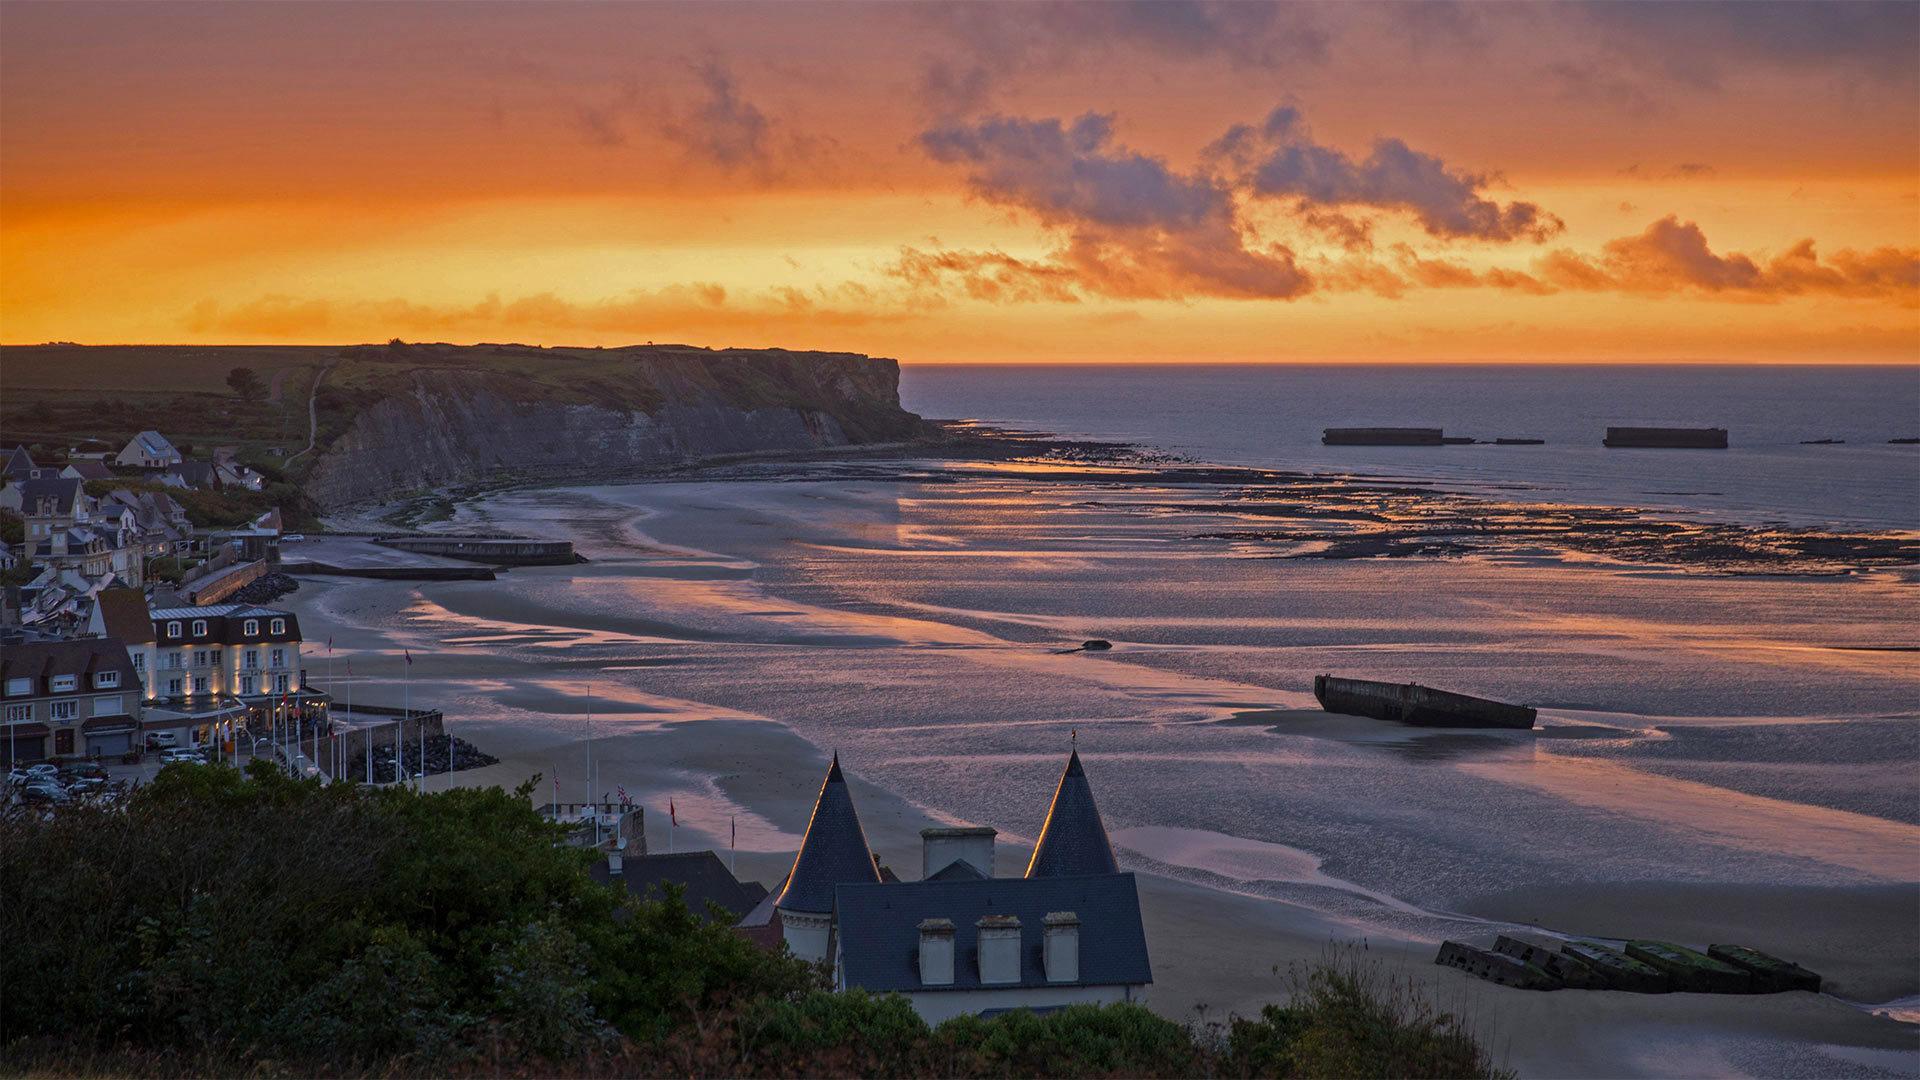 Normandy阿罗芒什莱班的桑树港Normandy